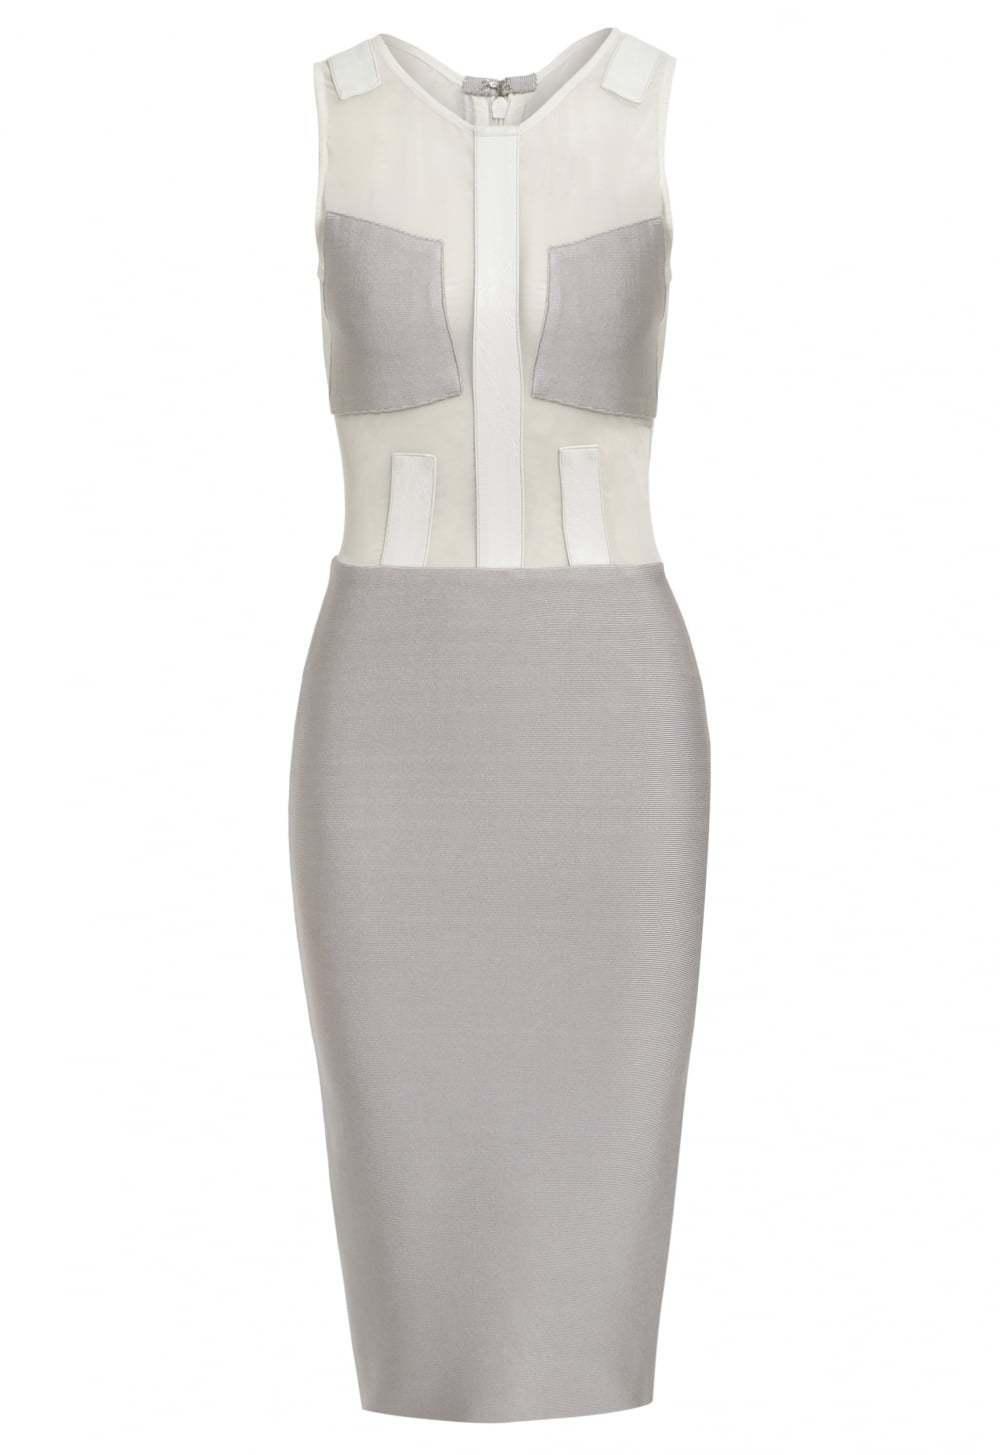 Novo London Victoria Dress Size S LF077 ii 10